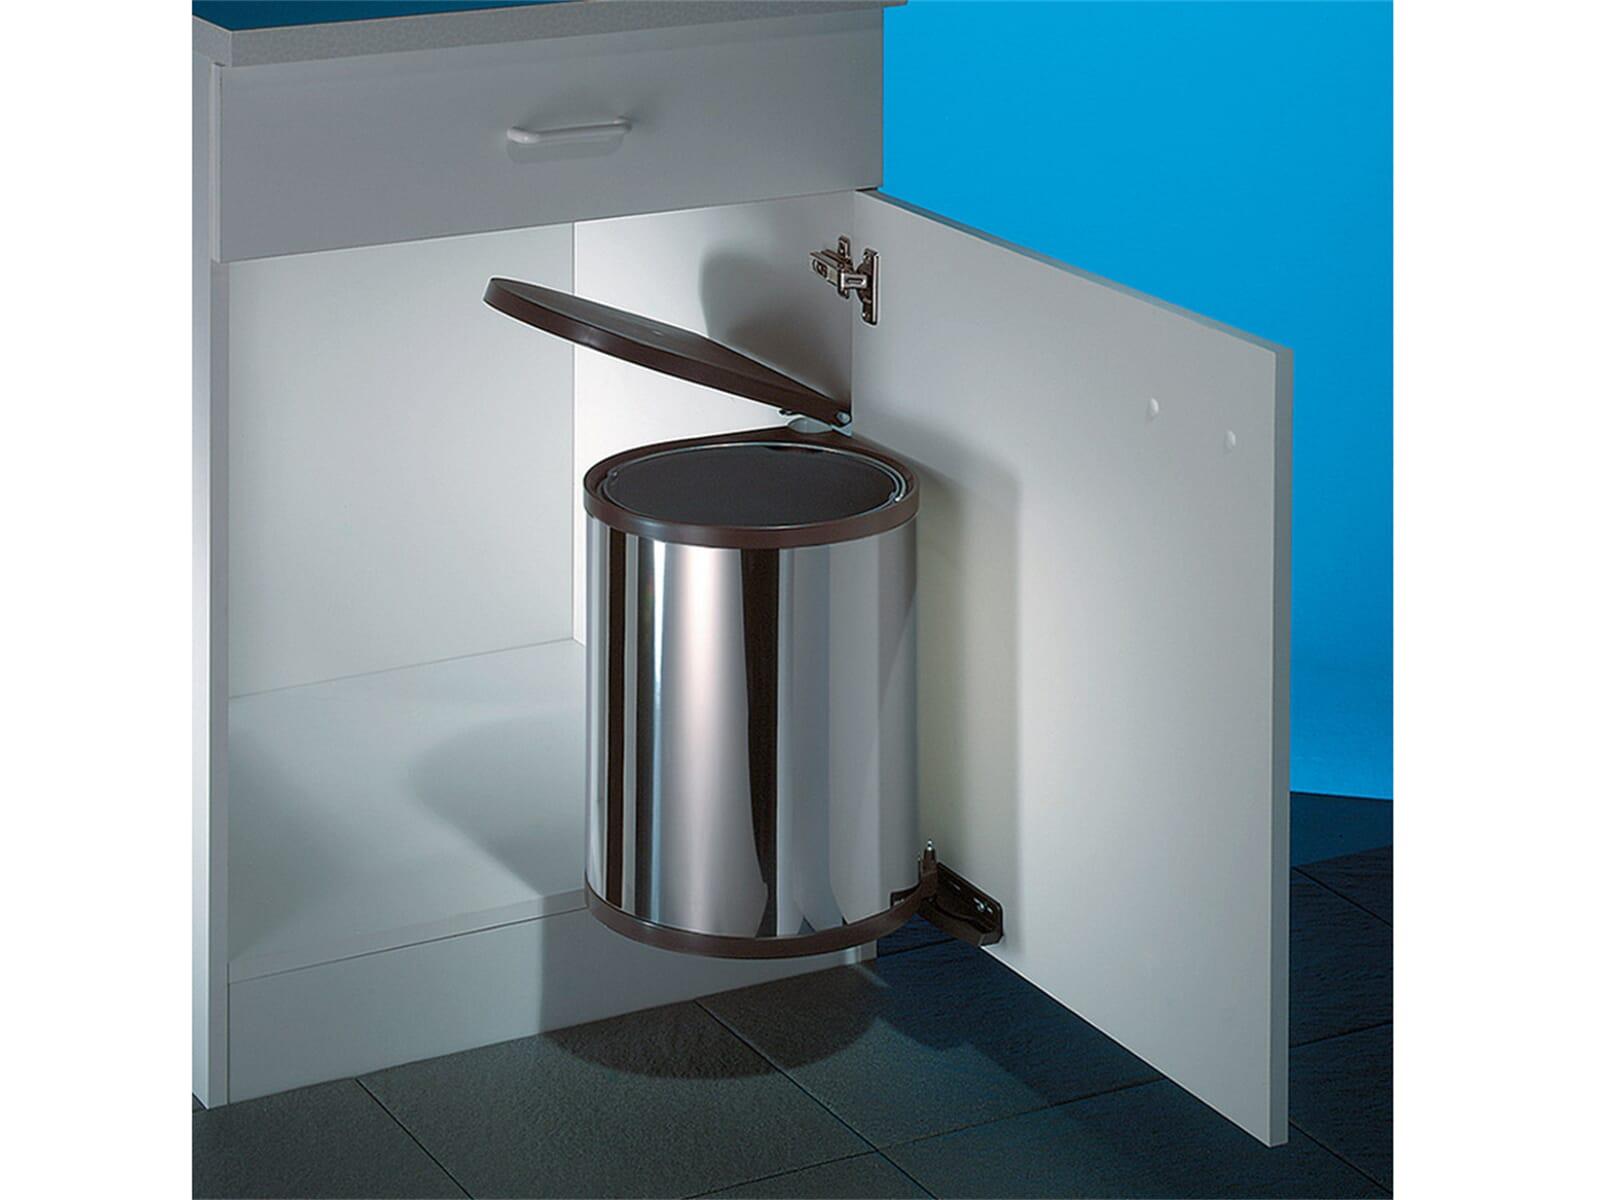 naber rondo 2 edelstahl einbau abfallsammler f r 38 90 eur. Black Bedroom Furniture Sets. Home Design Ideas